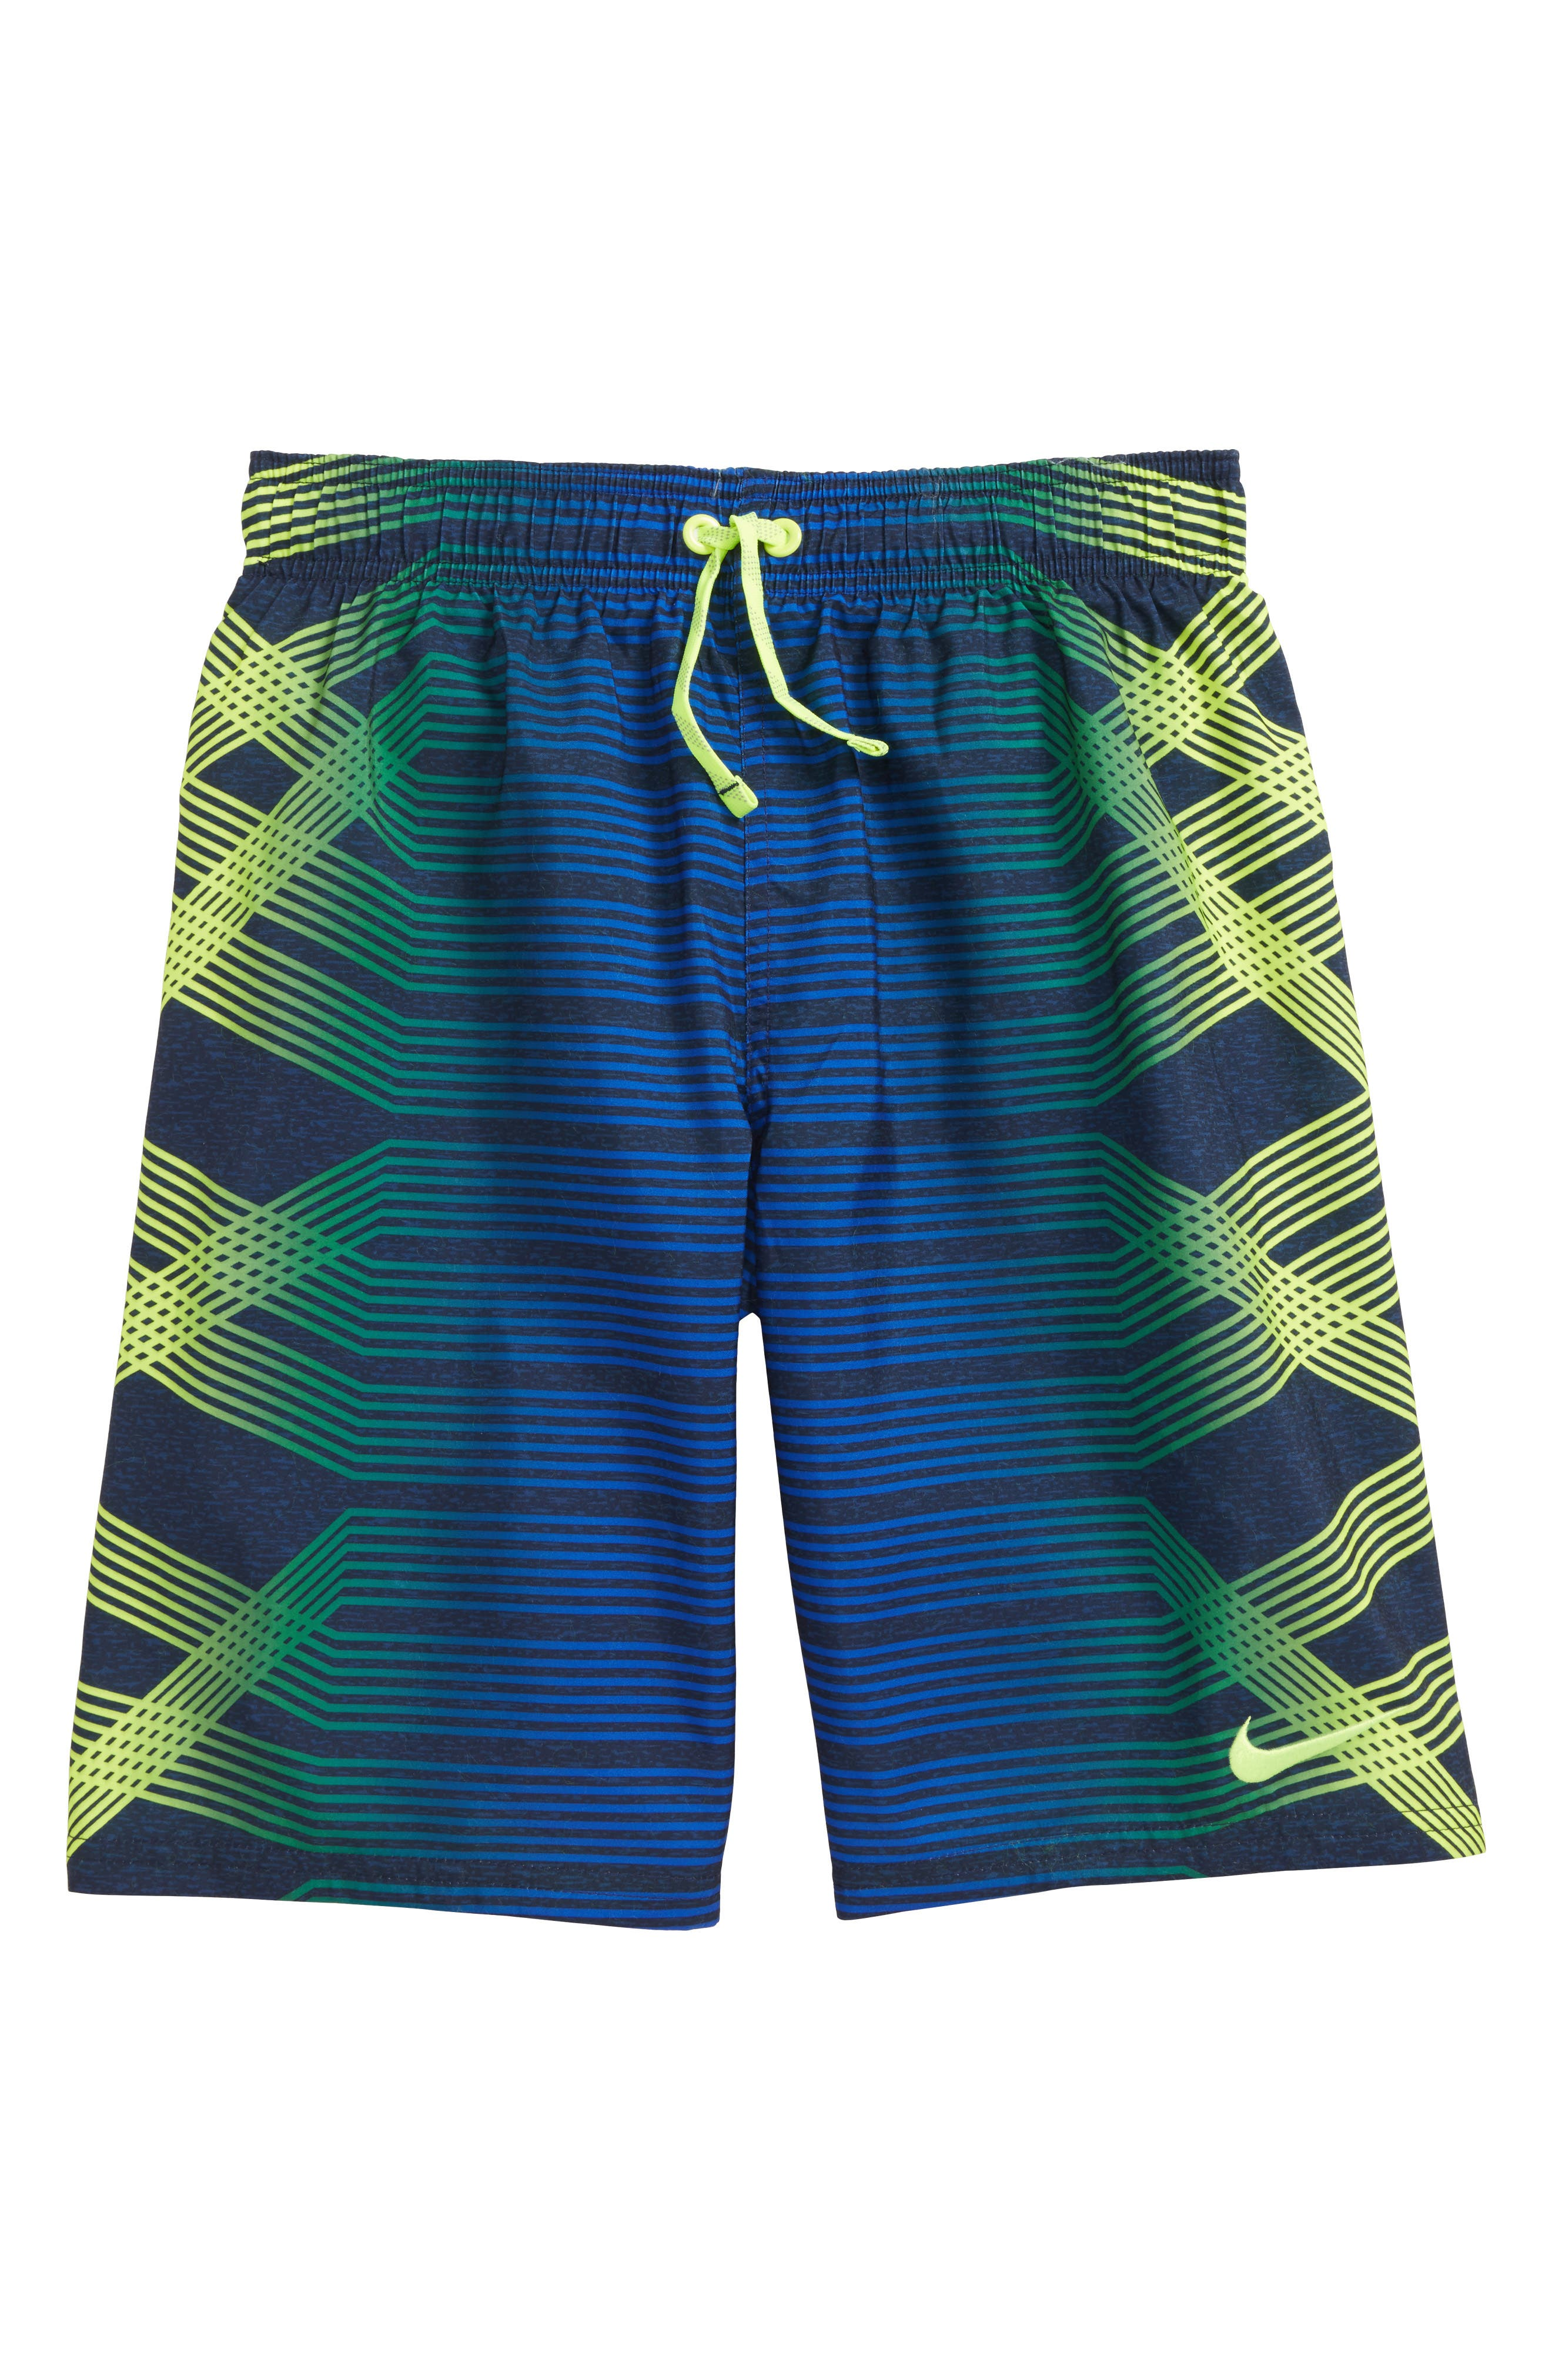 Nike Breaker Volley Shorts (Big Boys)